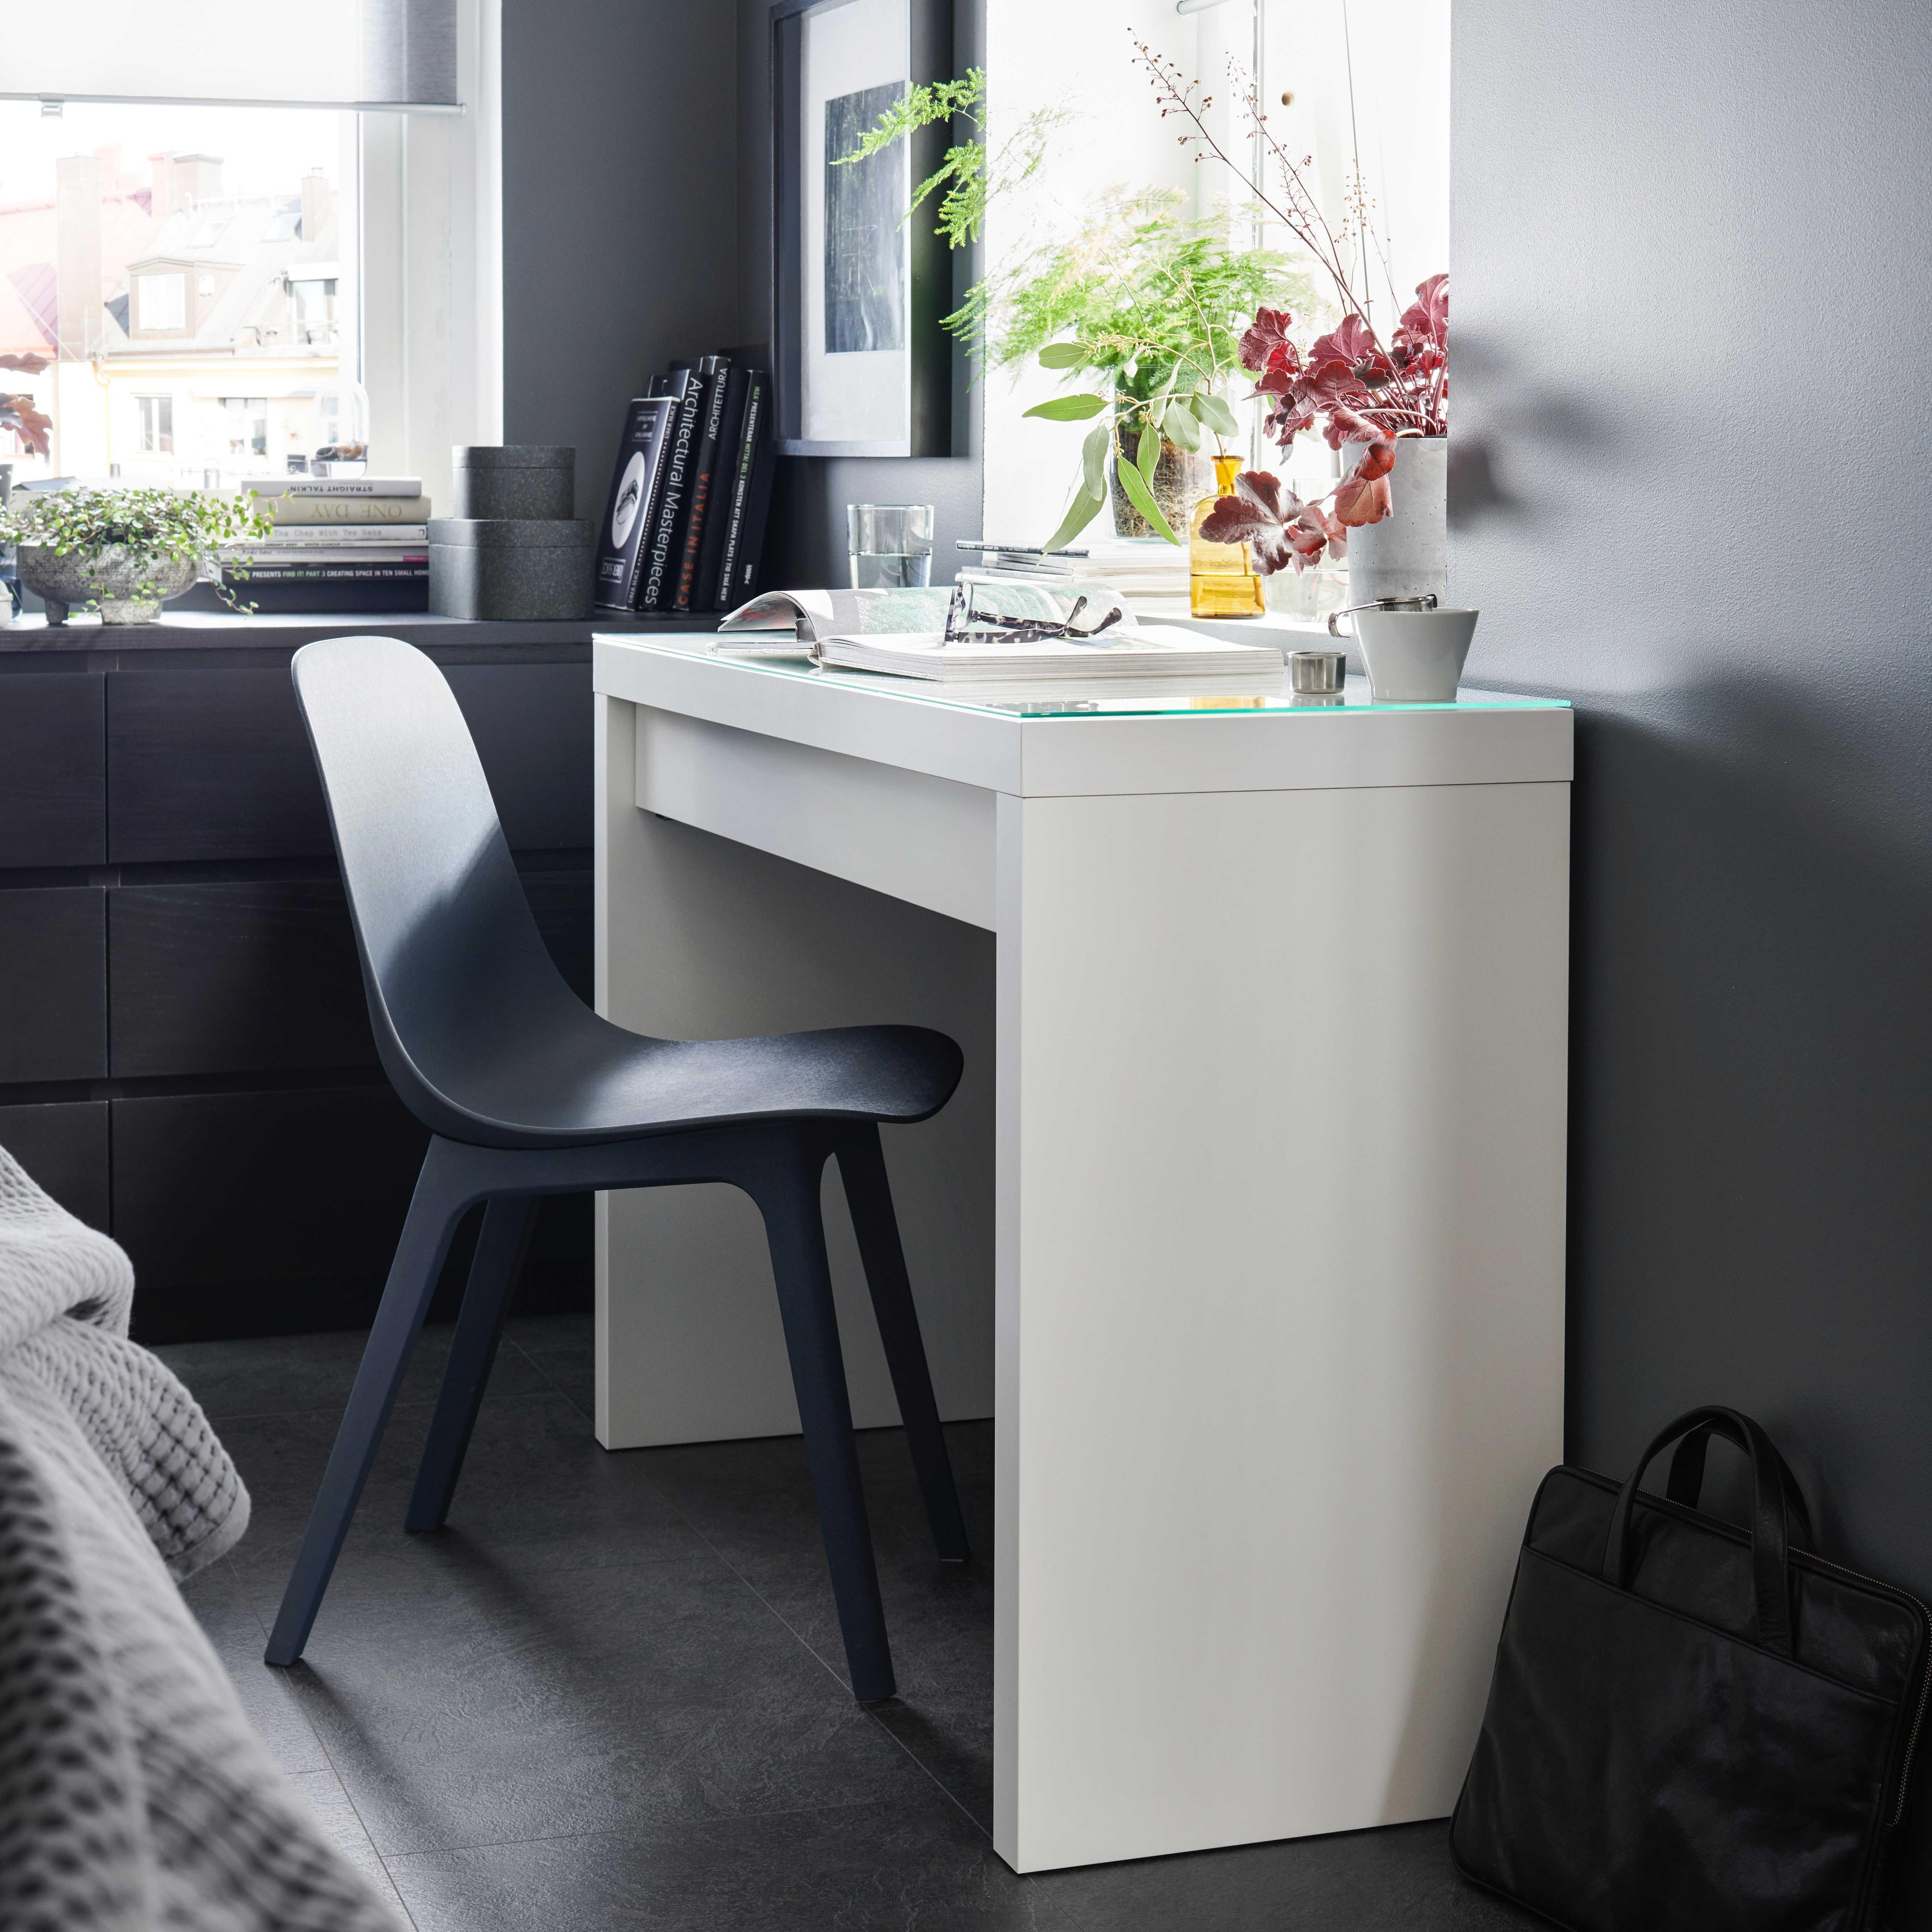 Malm Toilettafel Wit 120x41 Cm Ikea Malm Ikea Make Up Bureau